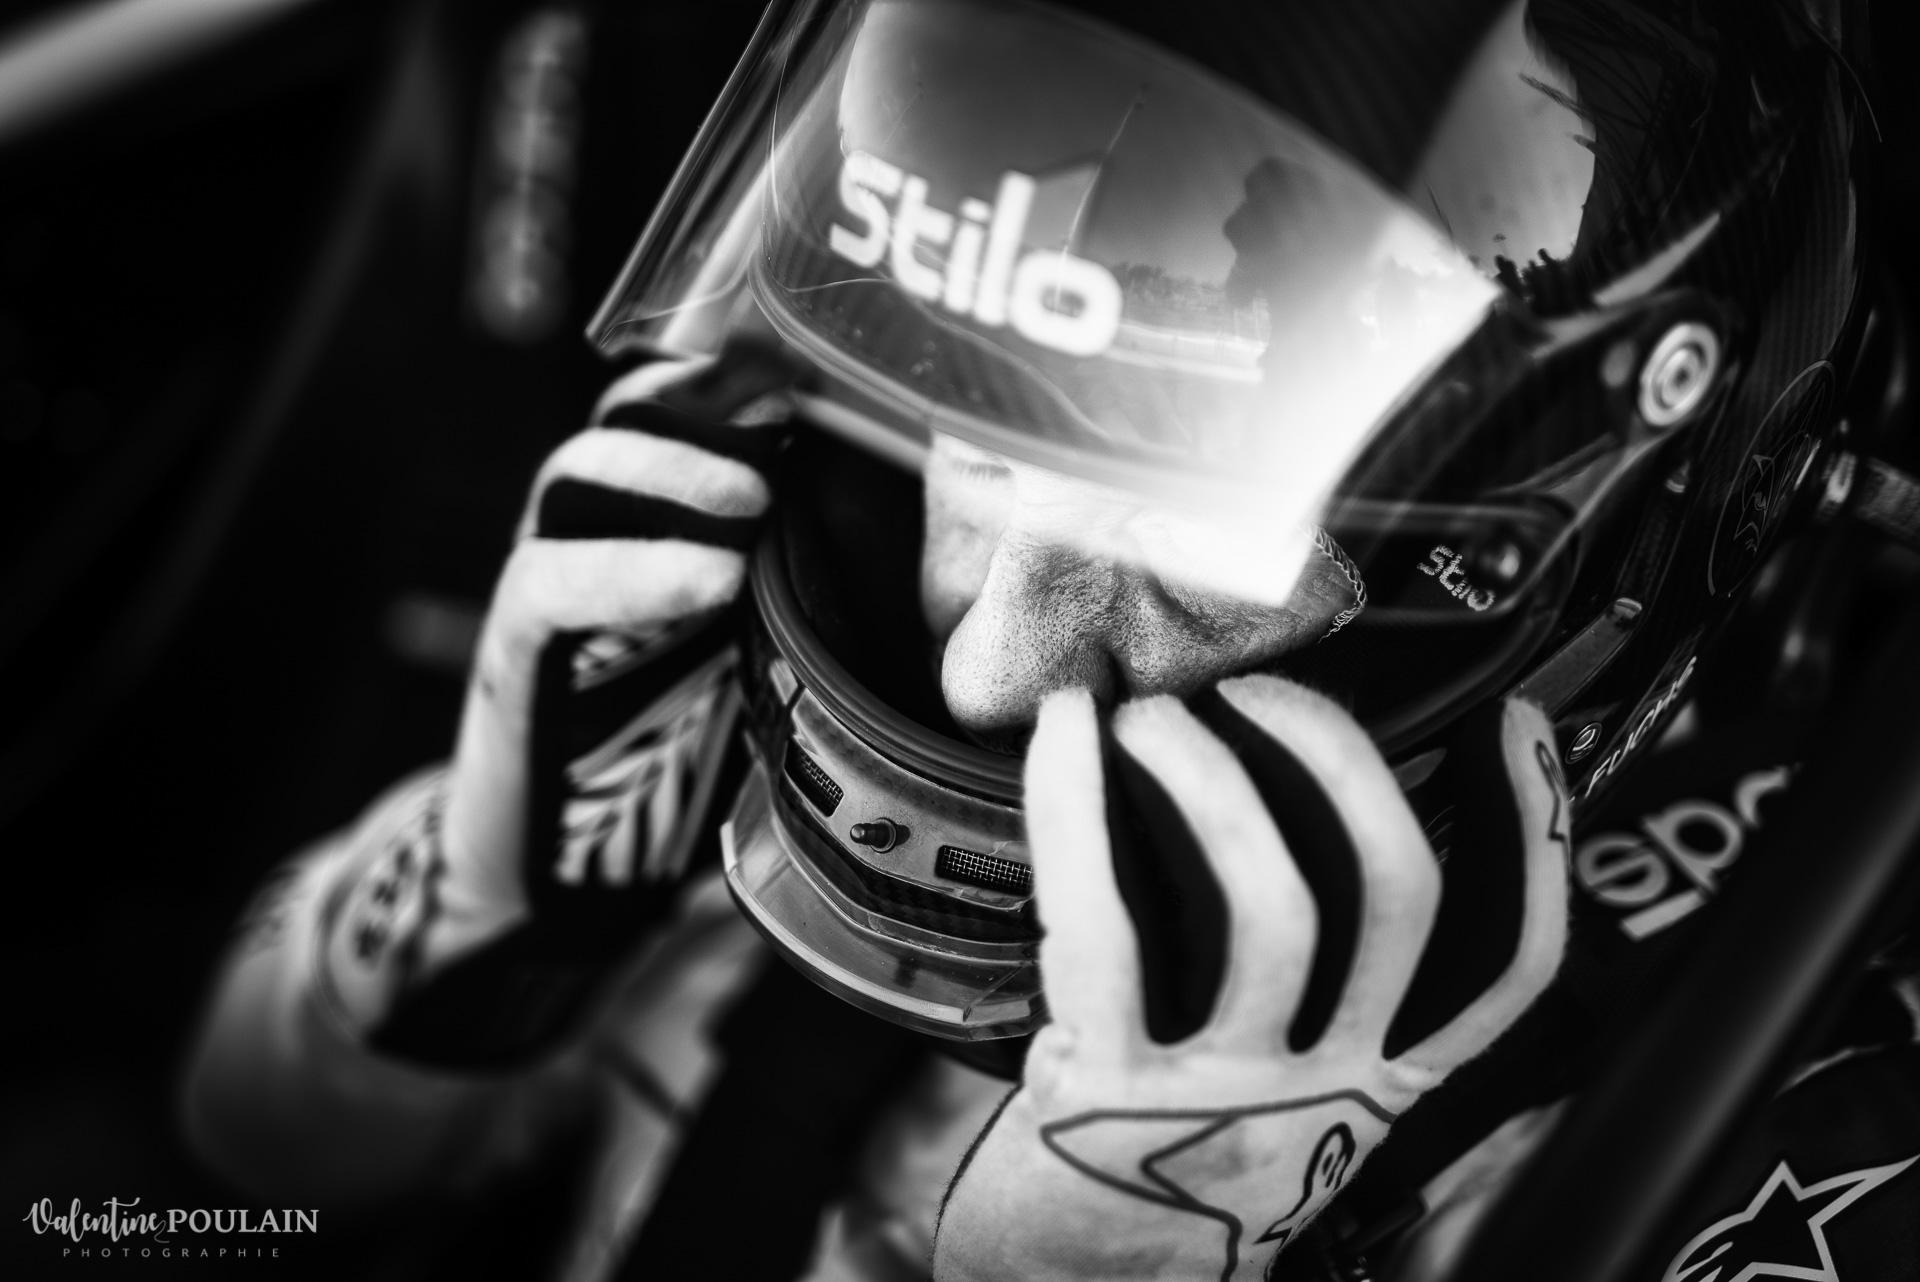 Portrait de pilote Evenement sportif Bugatti Chiron pur sport -automobile_Valentine Poulain -